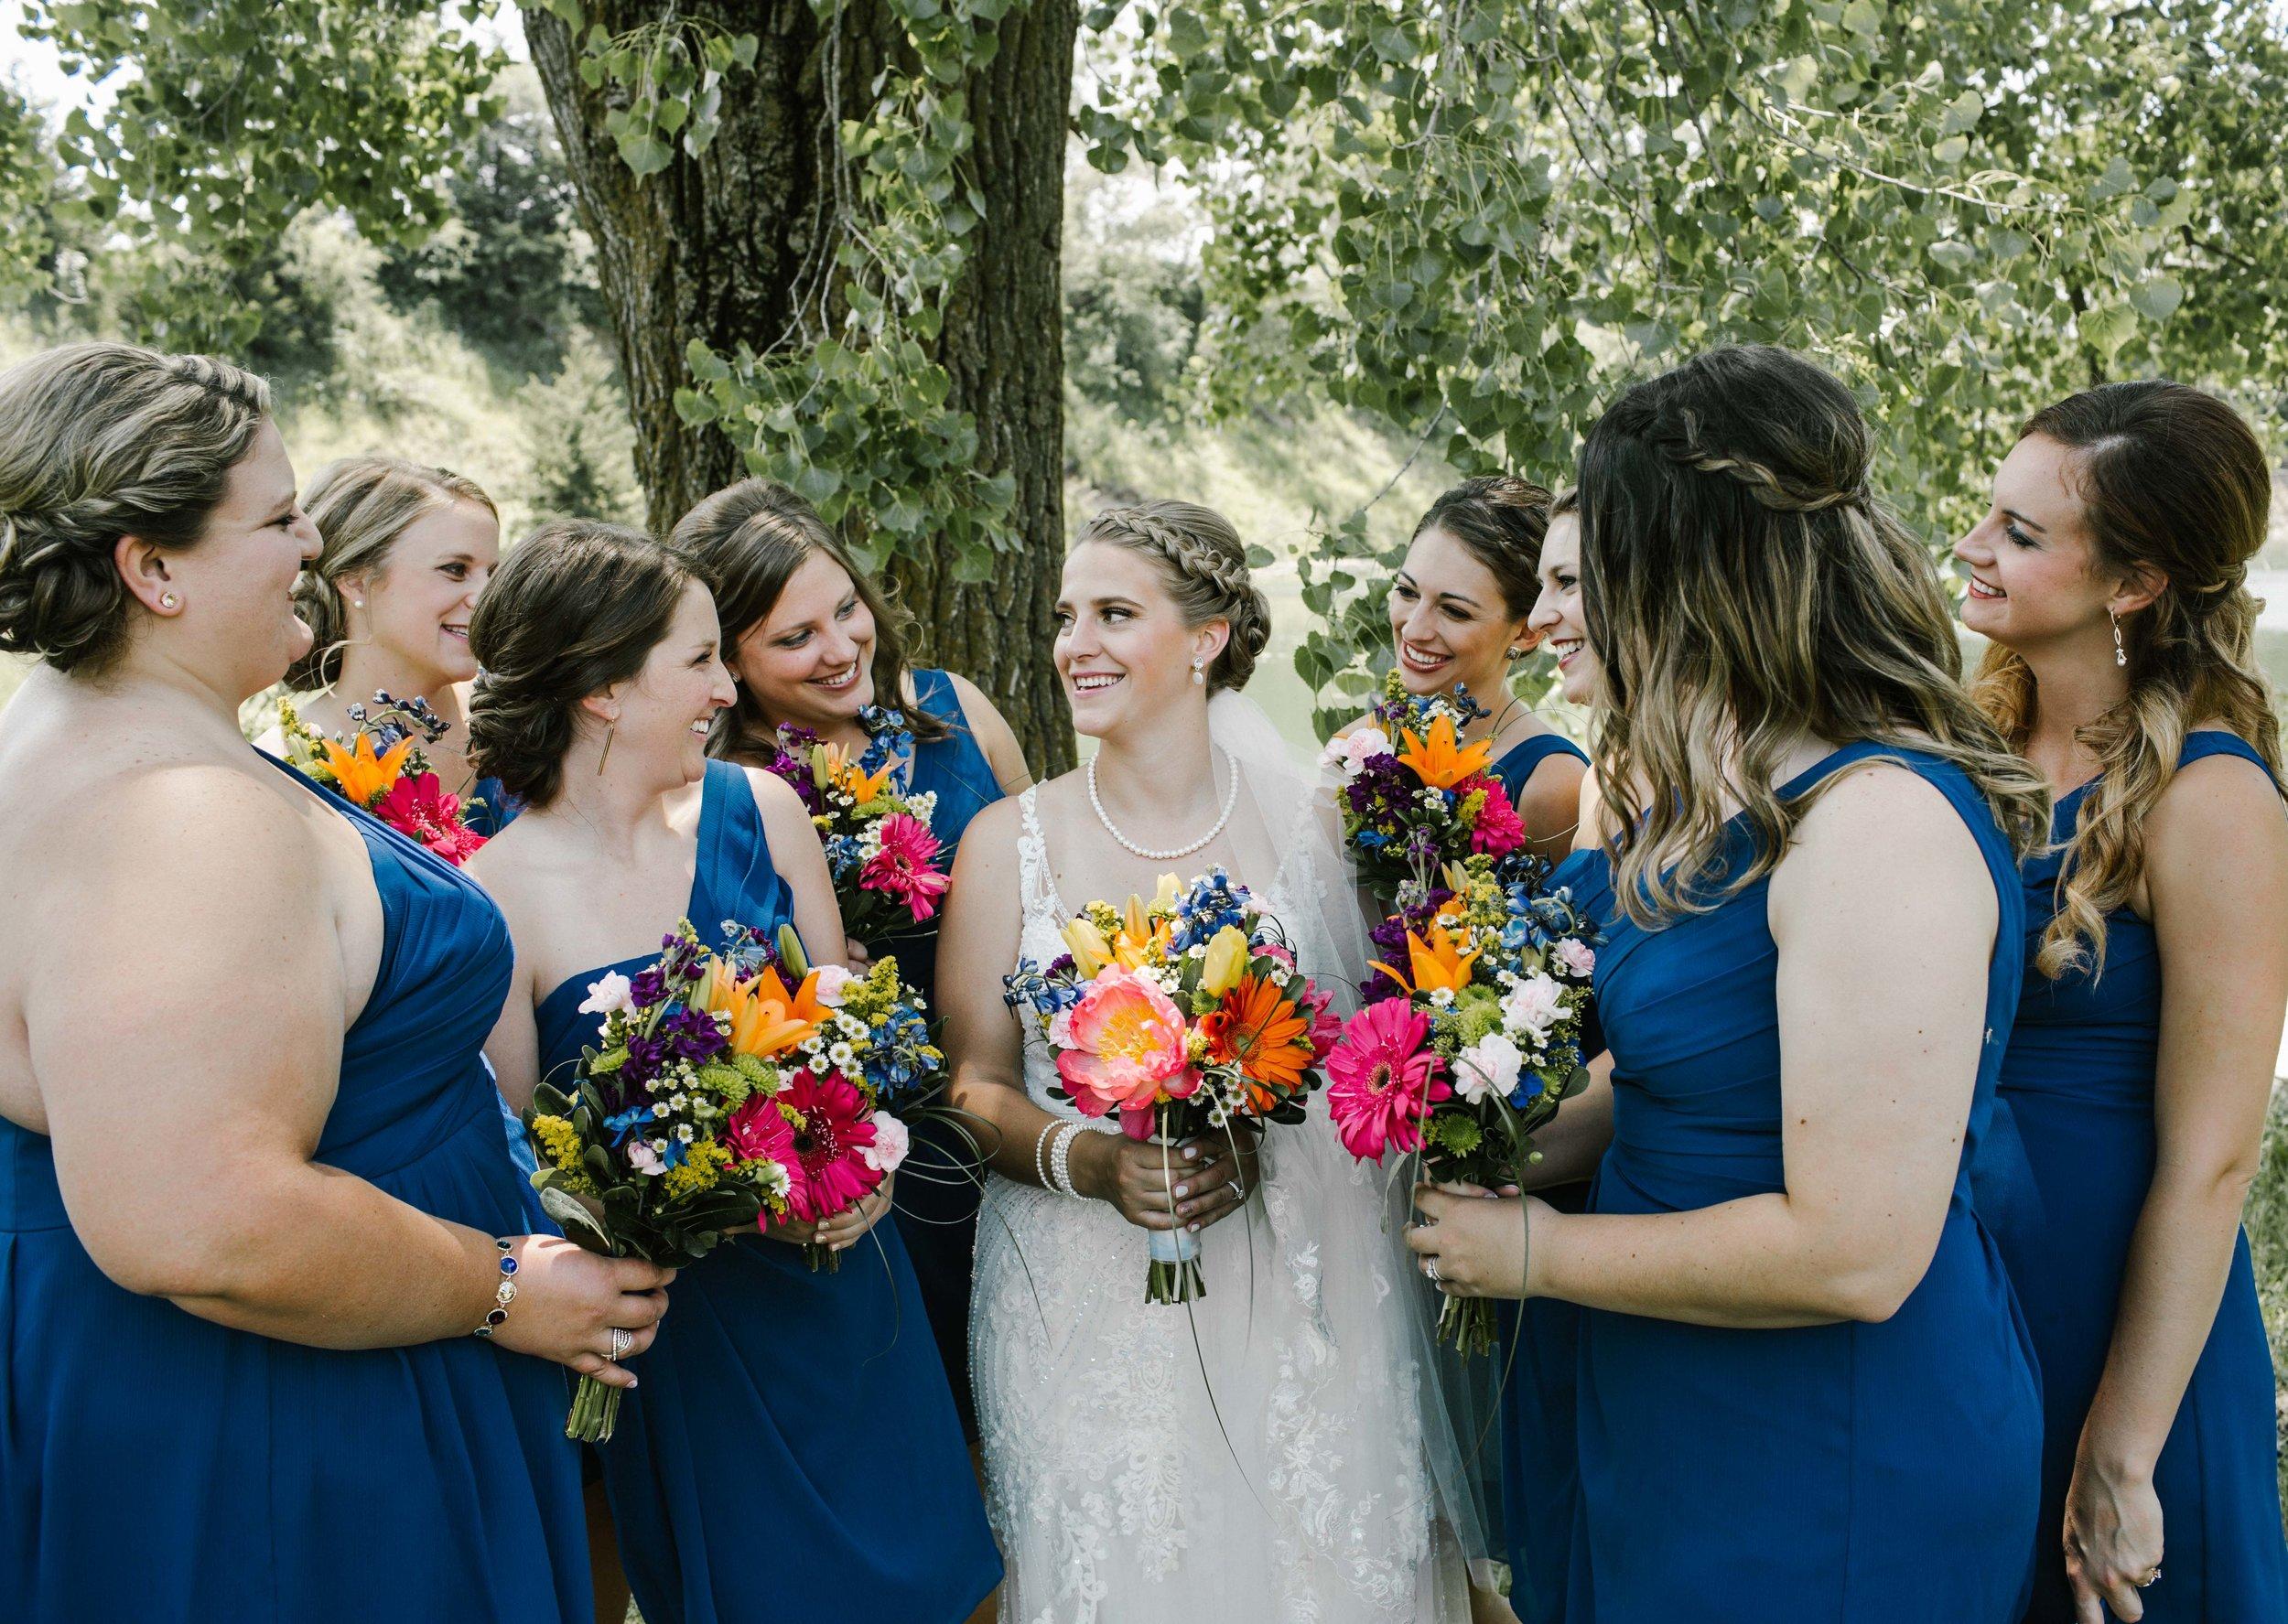 Iowa wedding_Dawn McClannan Photo-33.jpg